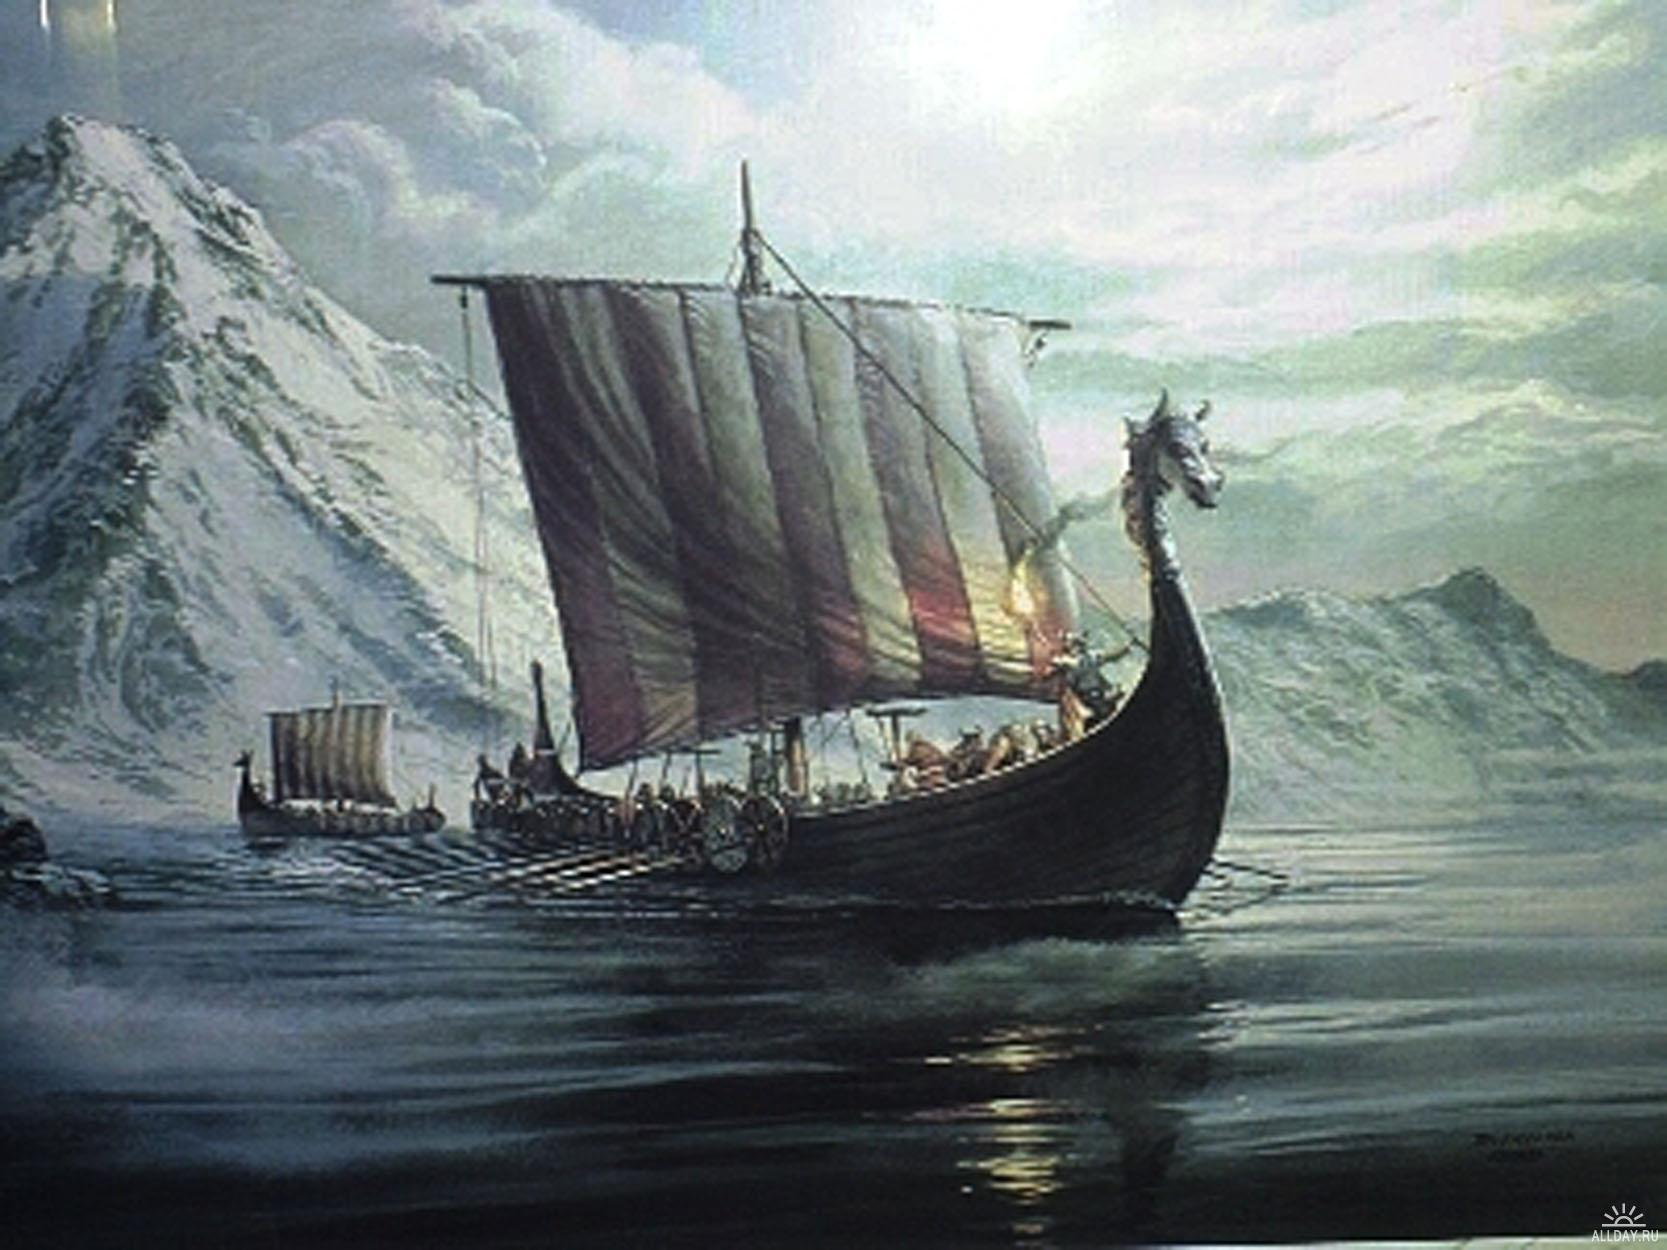 wallpaper viking wallpapers - photo #6